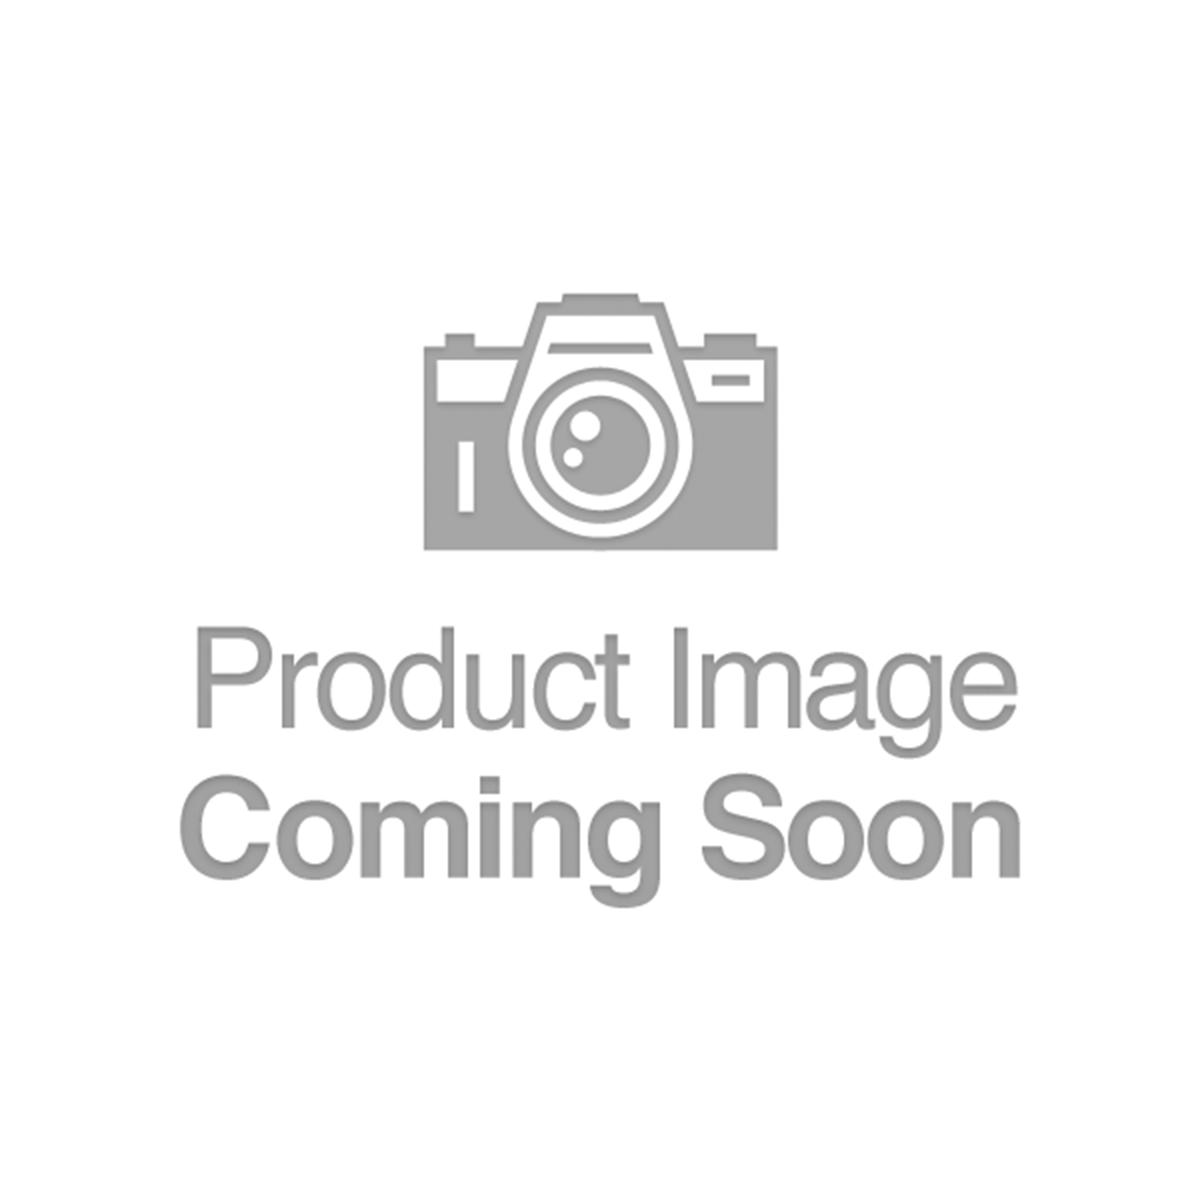 Marshall - Michigan - CH 1515 - FR 624 - PMG 63 EPQ